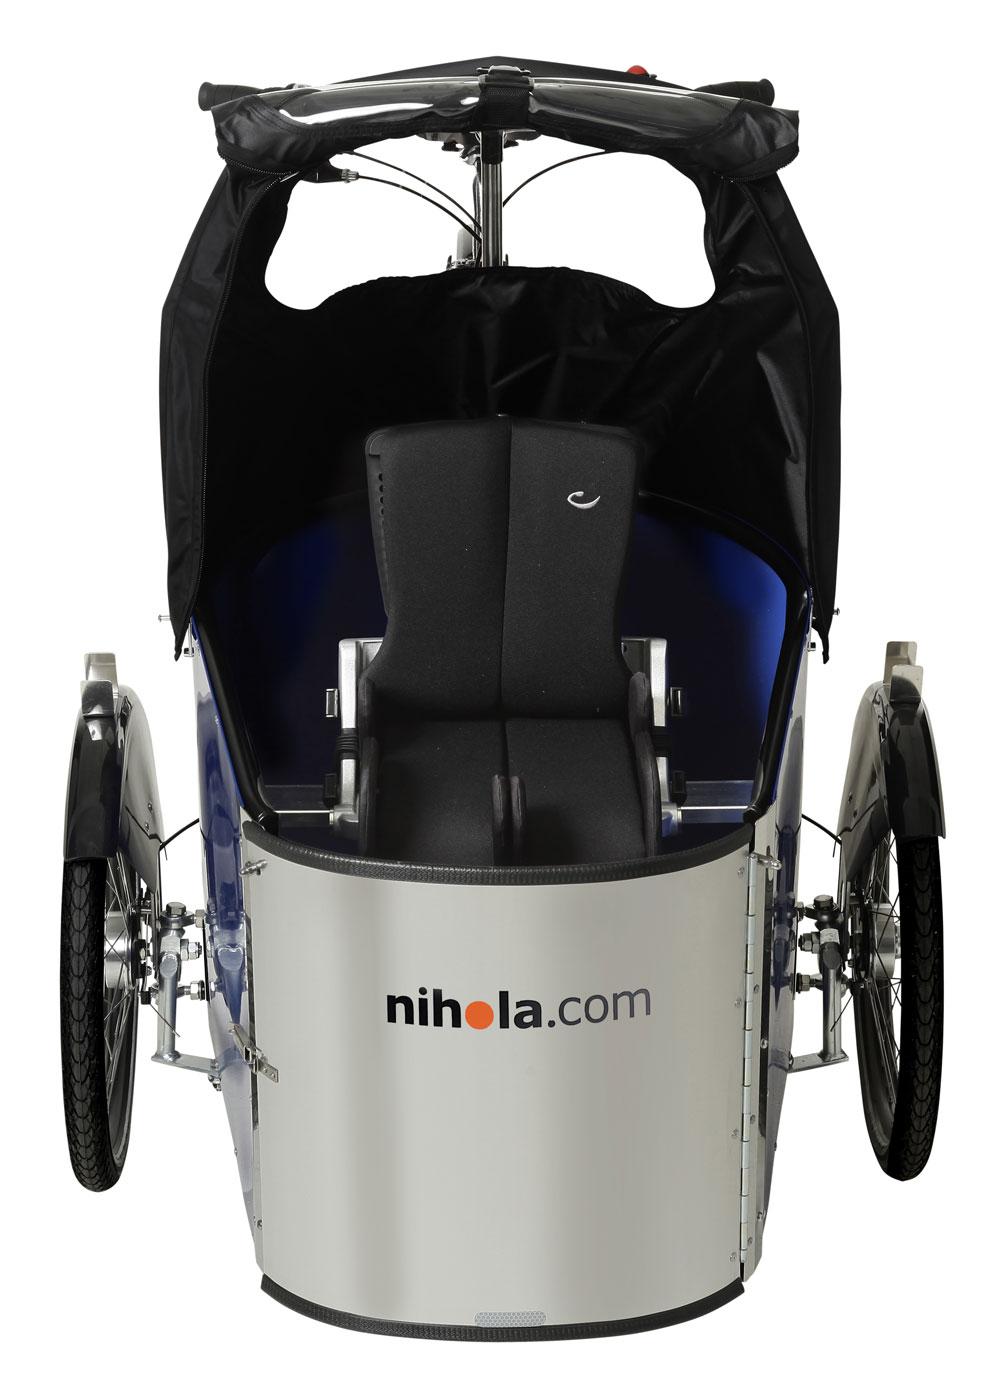 nihola rehab lastenfahrrad versandkostenfrei kaufen. Black Bedroom Furniture Sets. Home Design Ideas